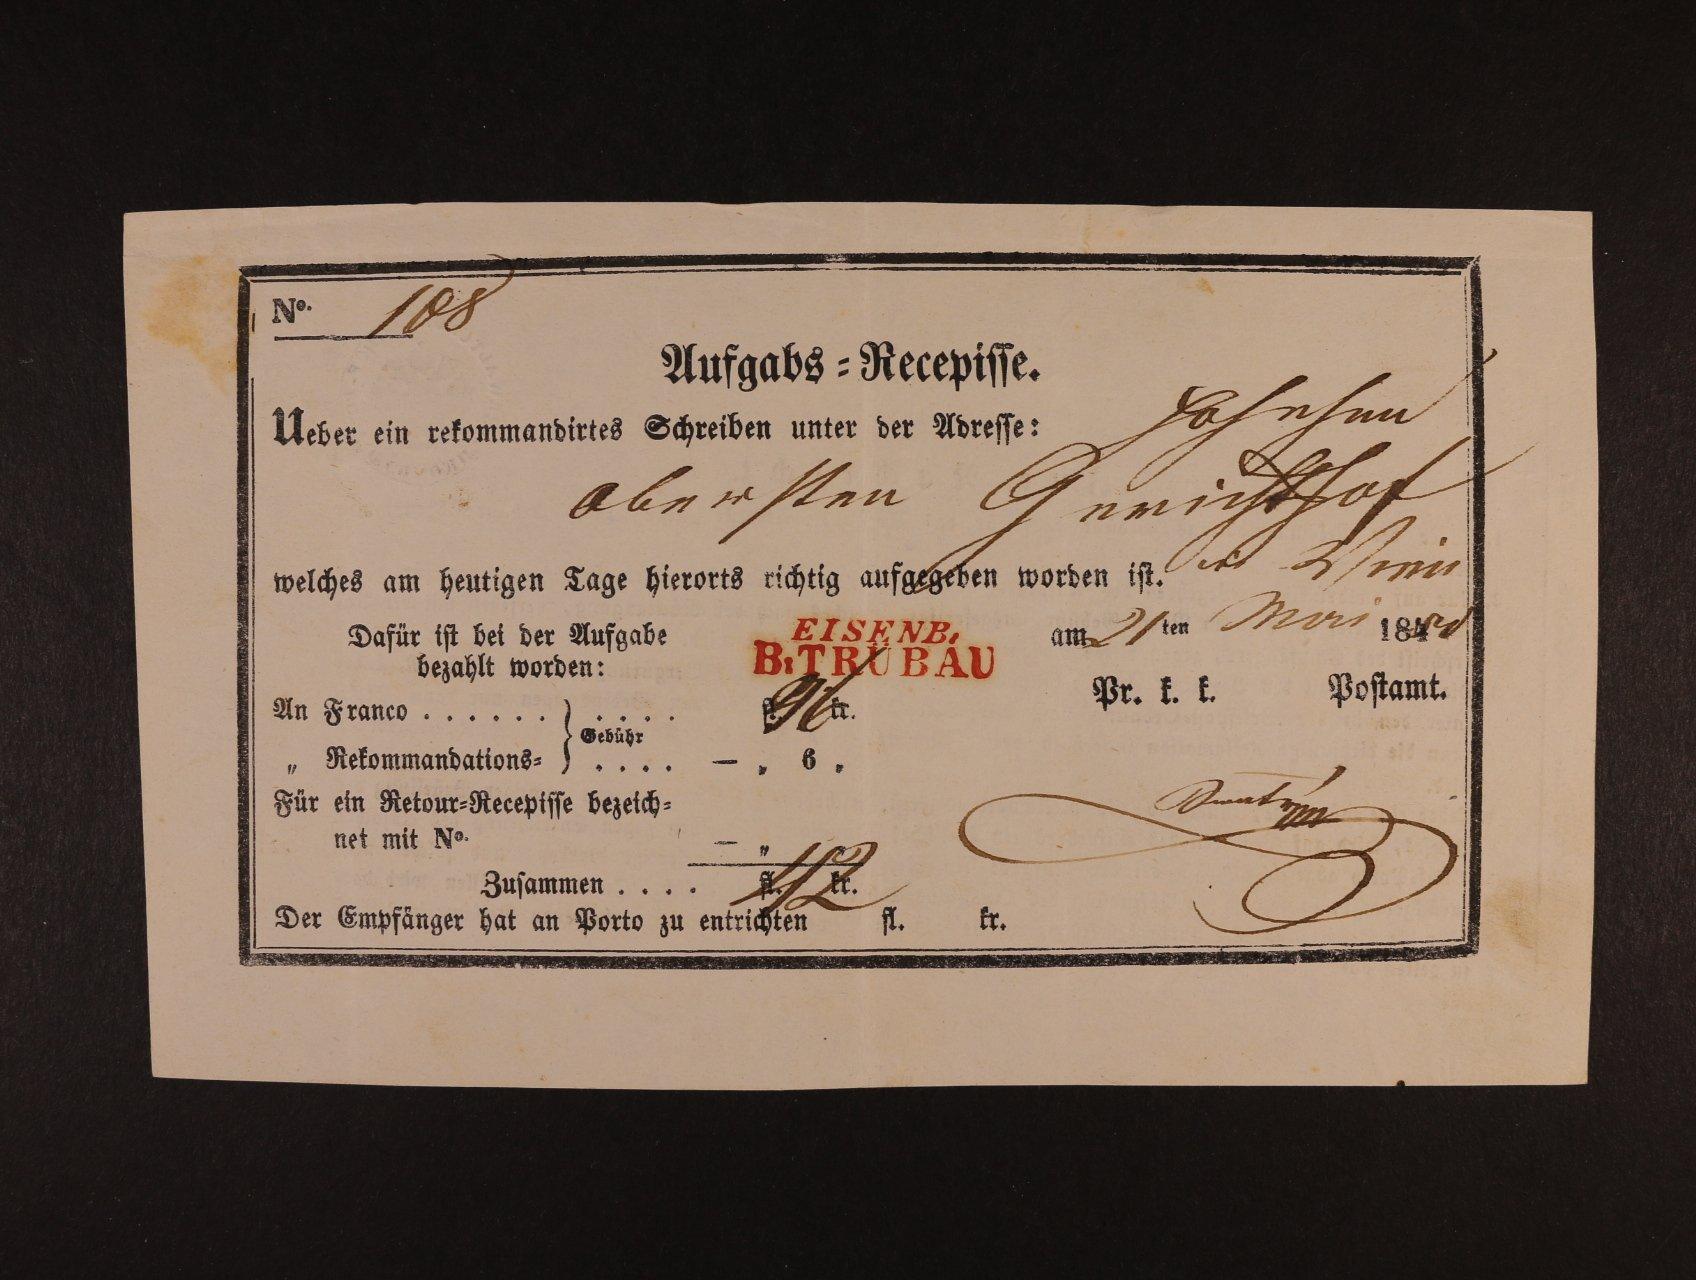 pod. lístek Aussgabs=Recepisse z r. 1844 s červeným řádkovým nádr. raz. EISENB B: TRÜBAU, lux. kvalita, zajímavé